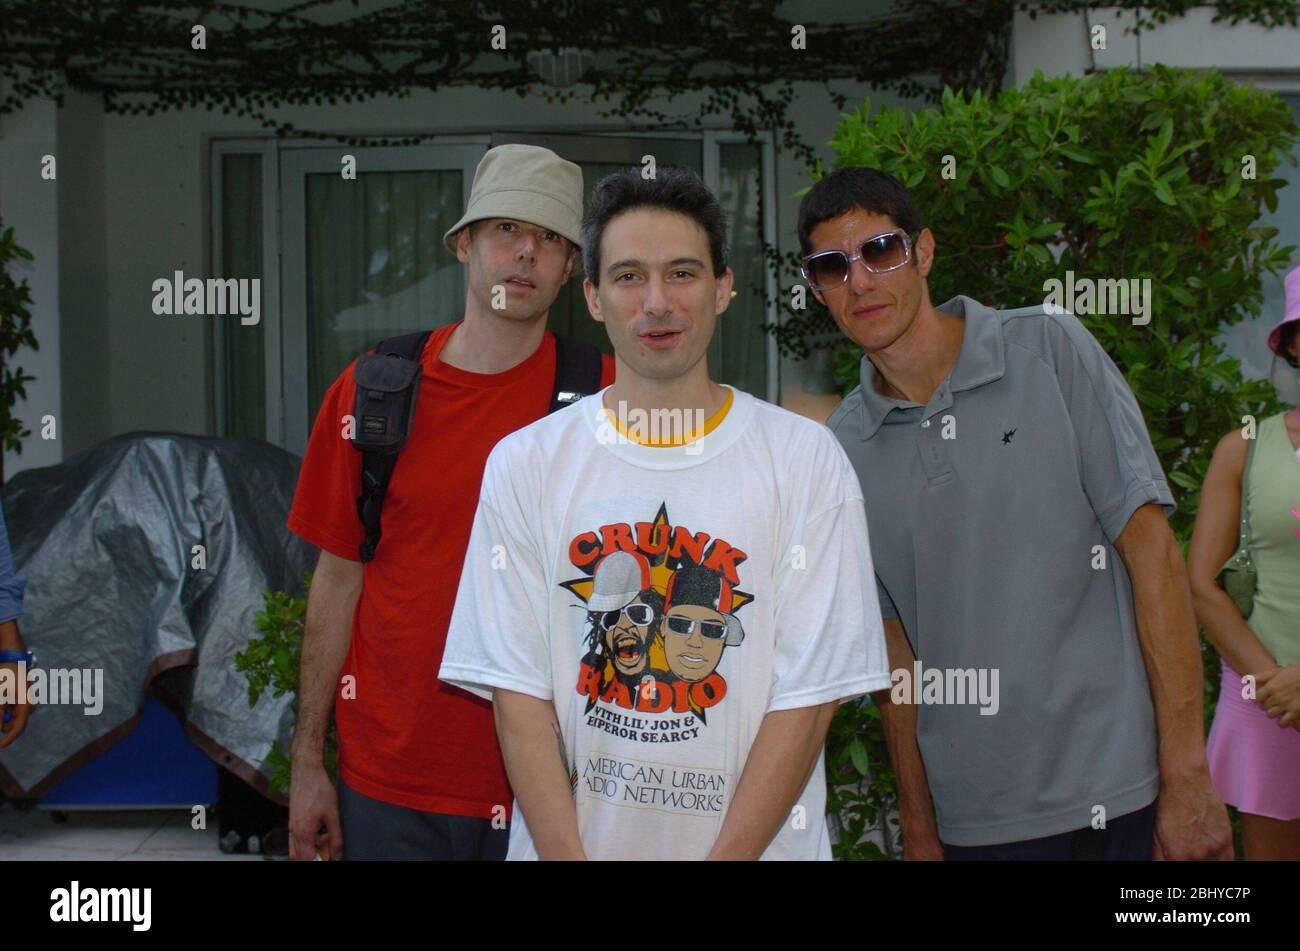 MIAMI BEACH, FL - APRIL 28, 2020: FILE PHOTO - Orig pix taken - 08/27/04  The Beastie Boys at the Style Villa in South Beach Miami Beach, Florida   People:  Beastie Boys_Adam Yauch Stock Photo